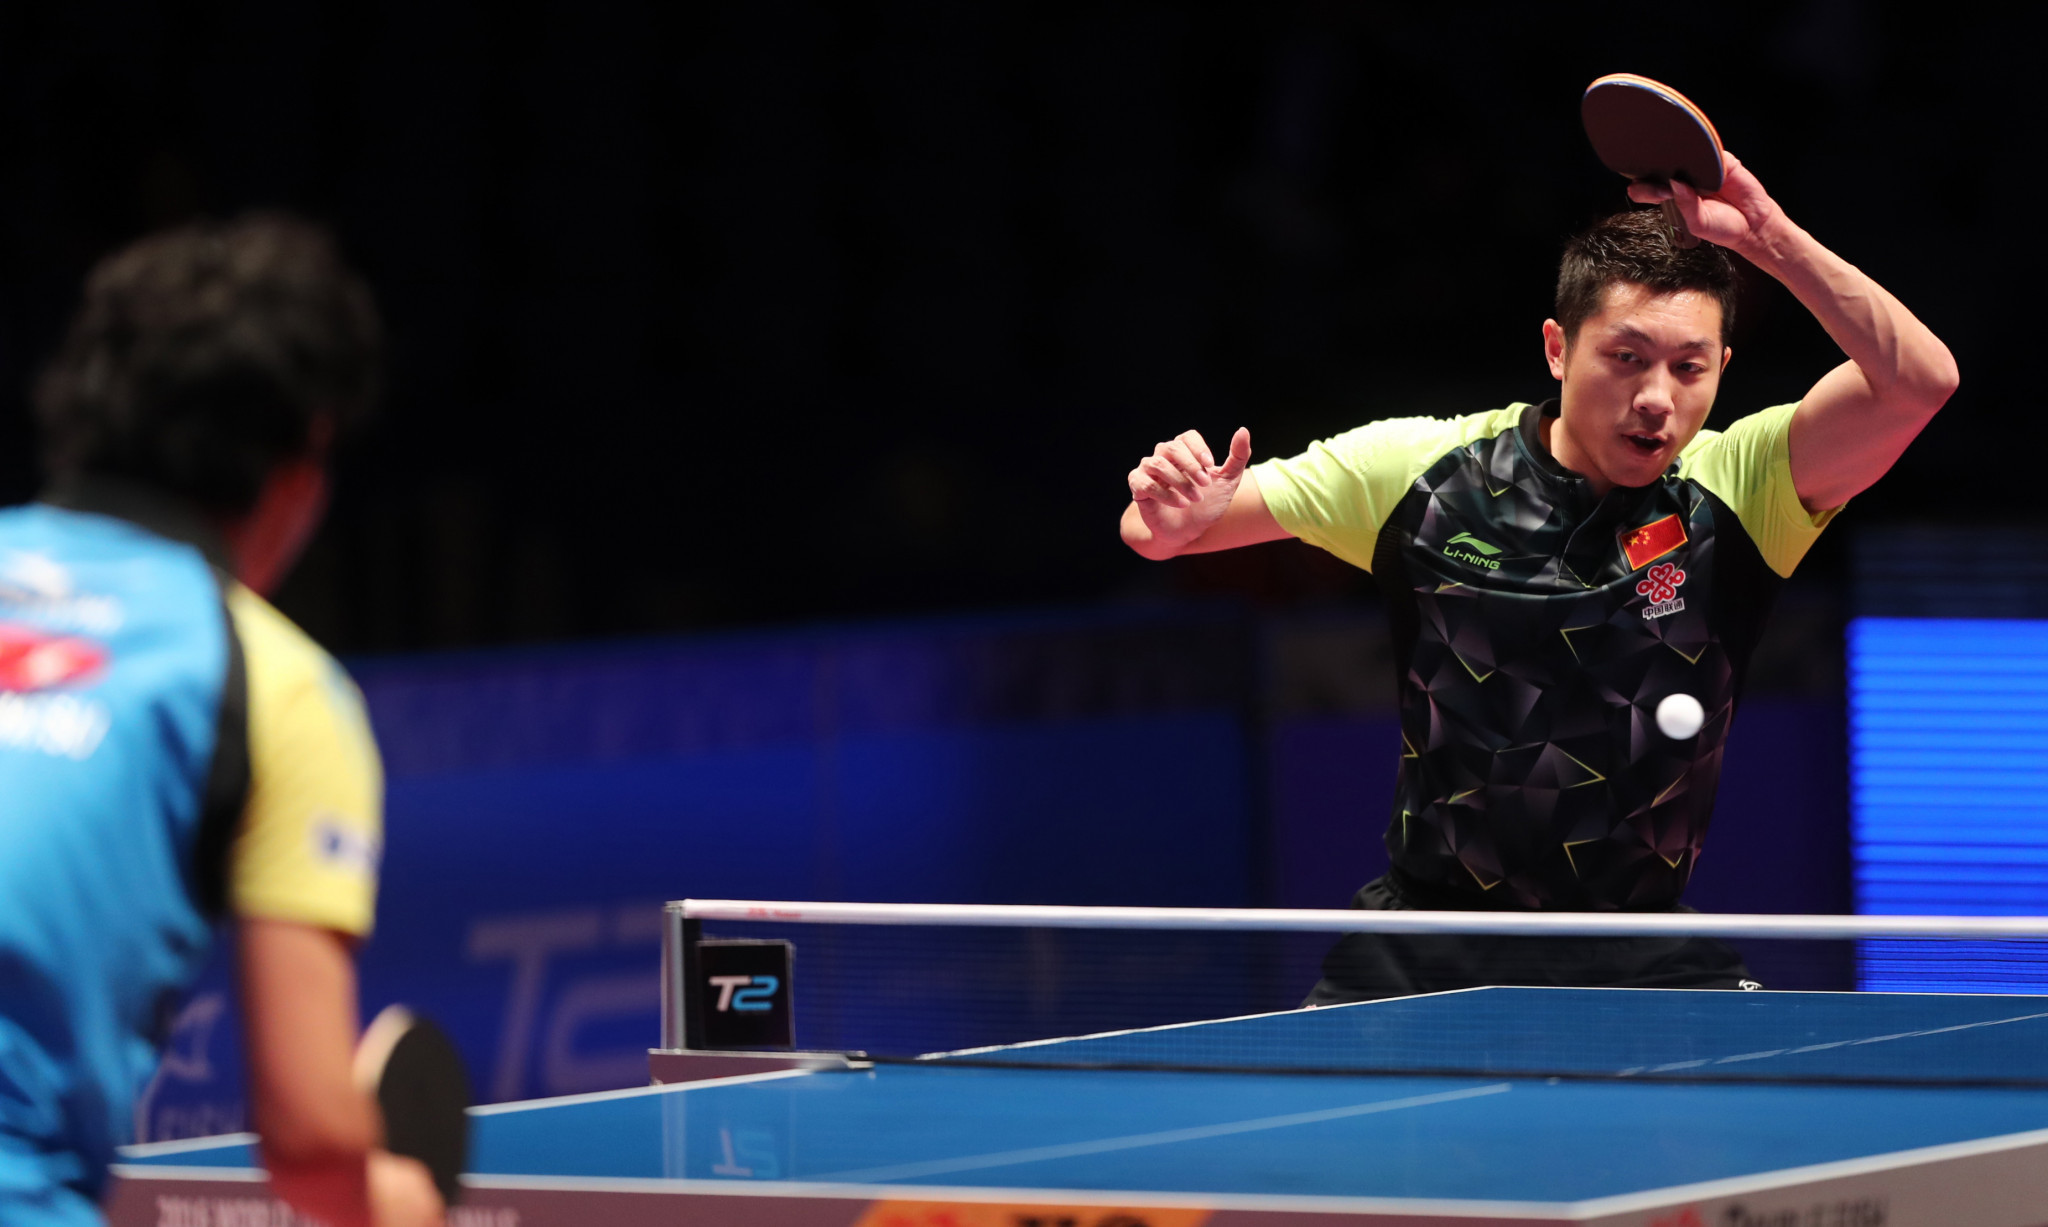 ITTF extend Eurosport partnership until 2020